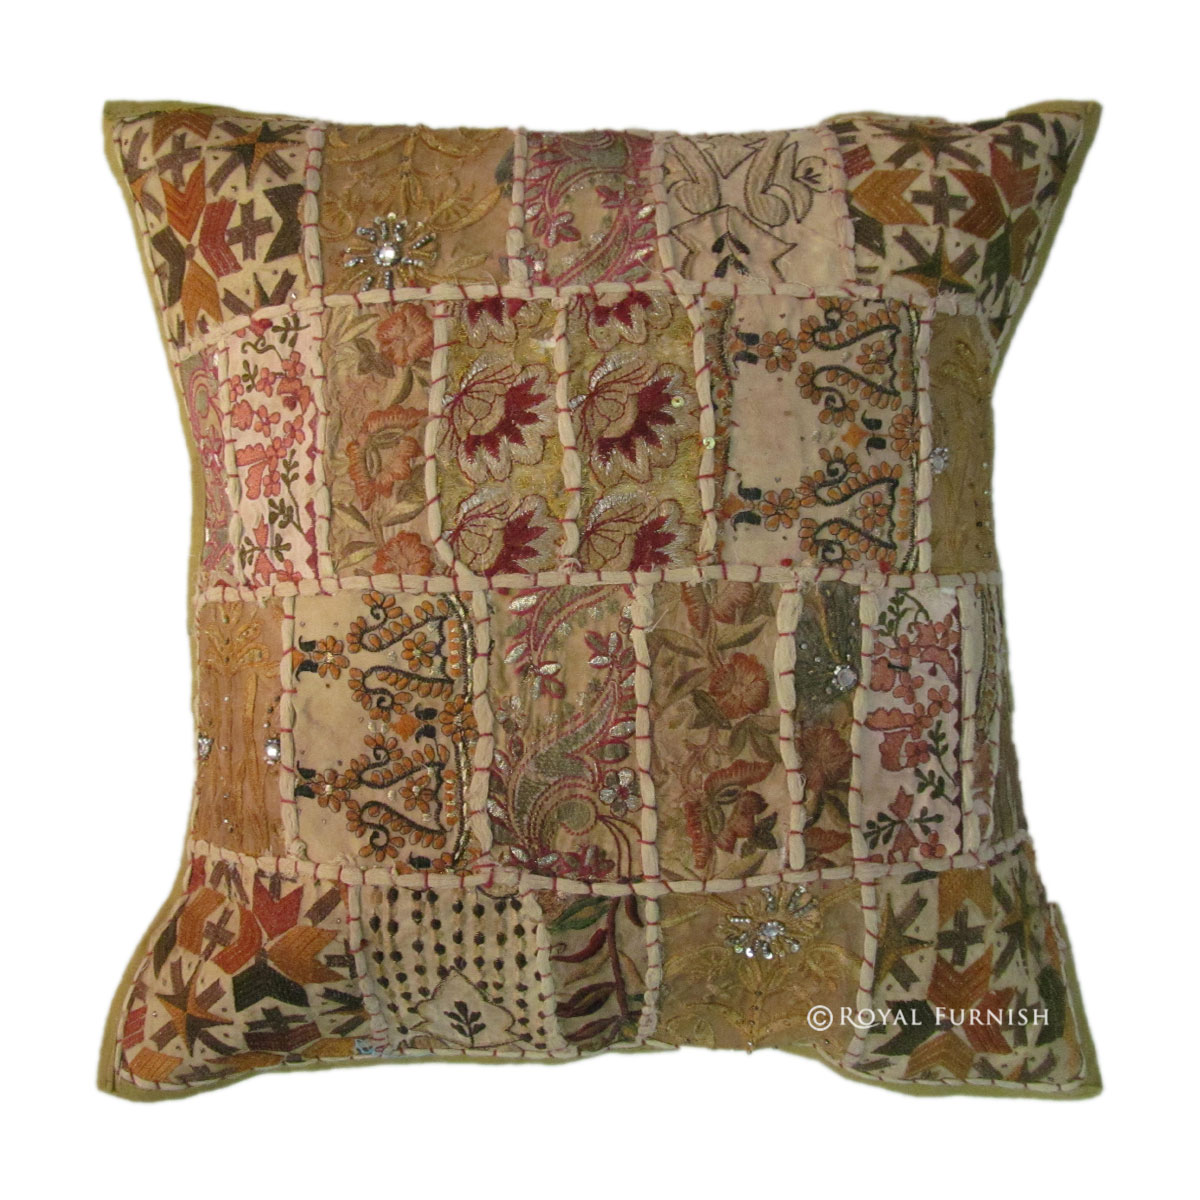 Green Antique India Patchwork Cotton Throw Pillow Sham - RoyalFurnish.com